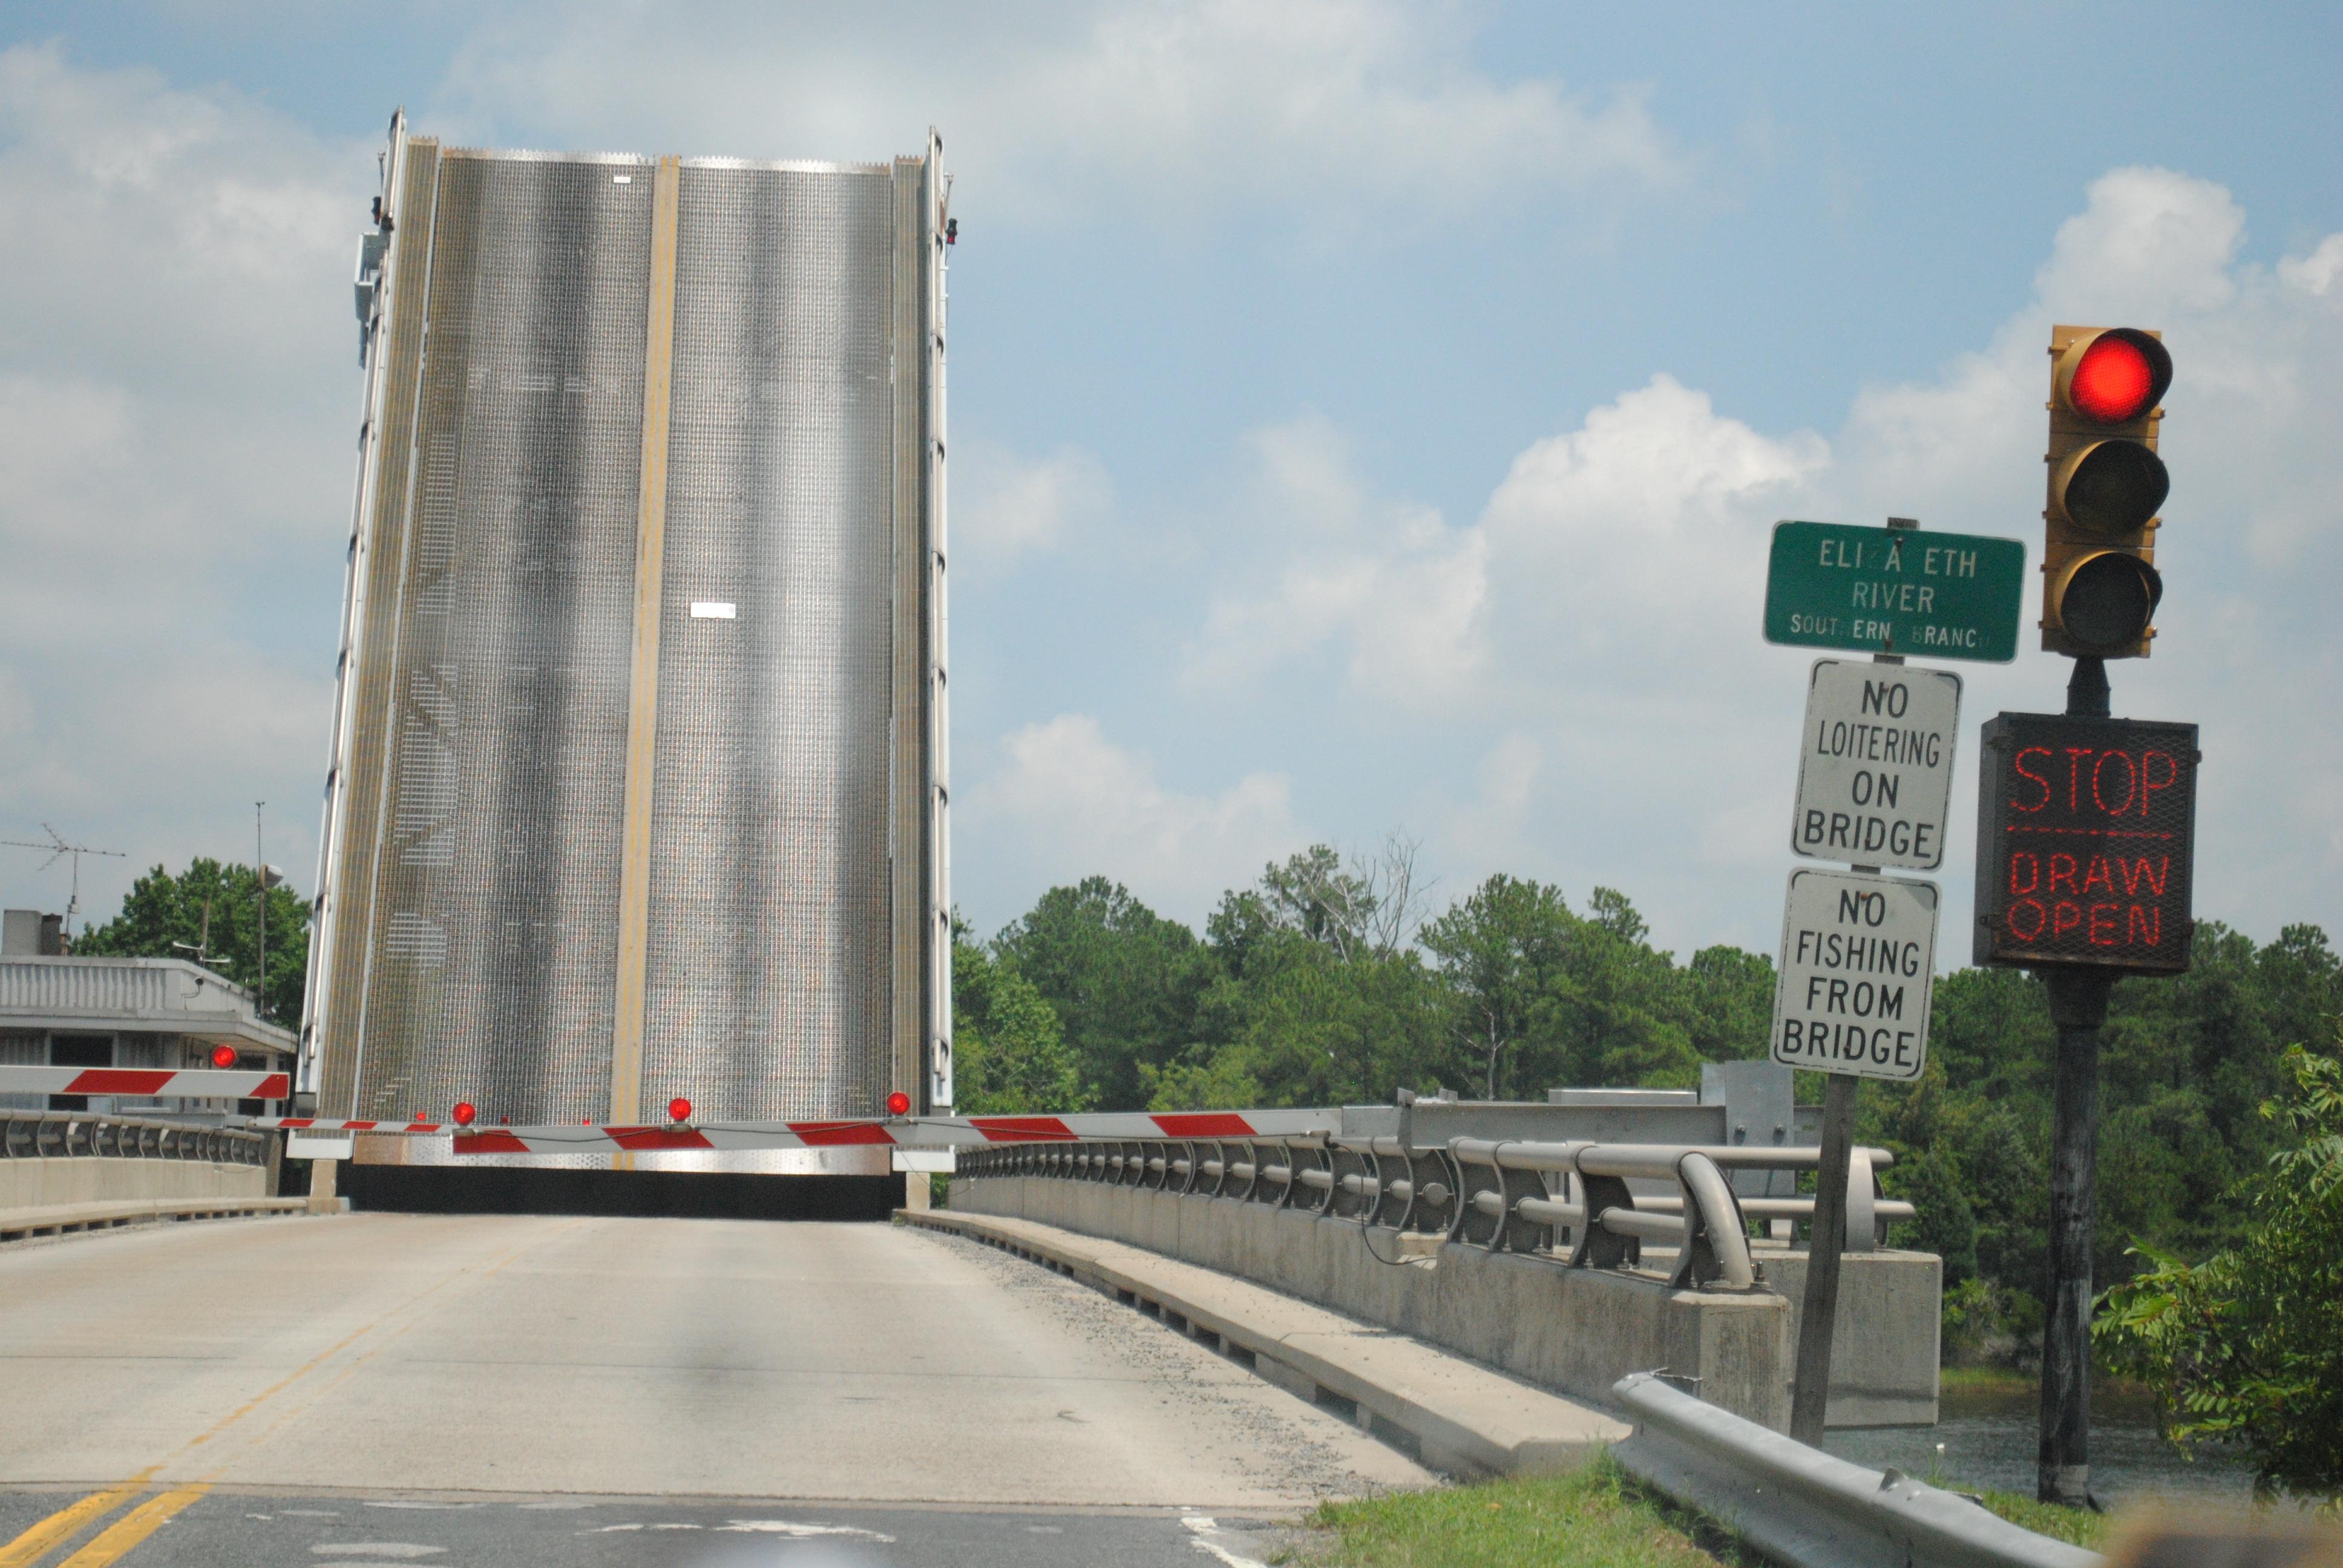 Deep creek steel bridge - chesapeake